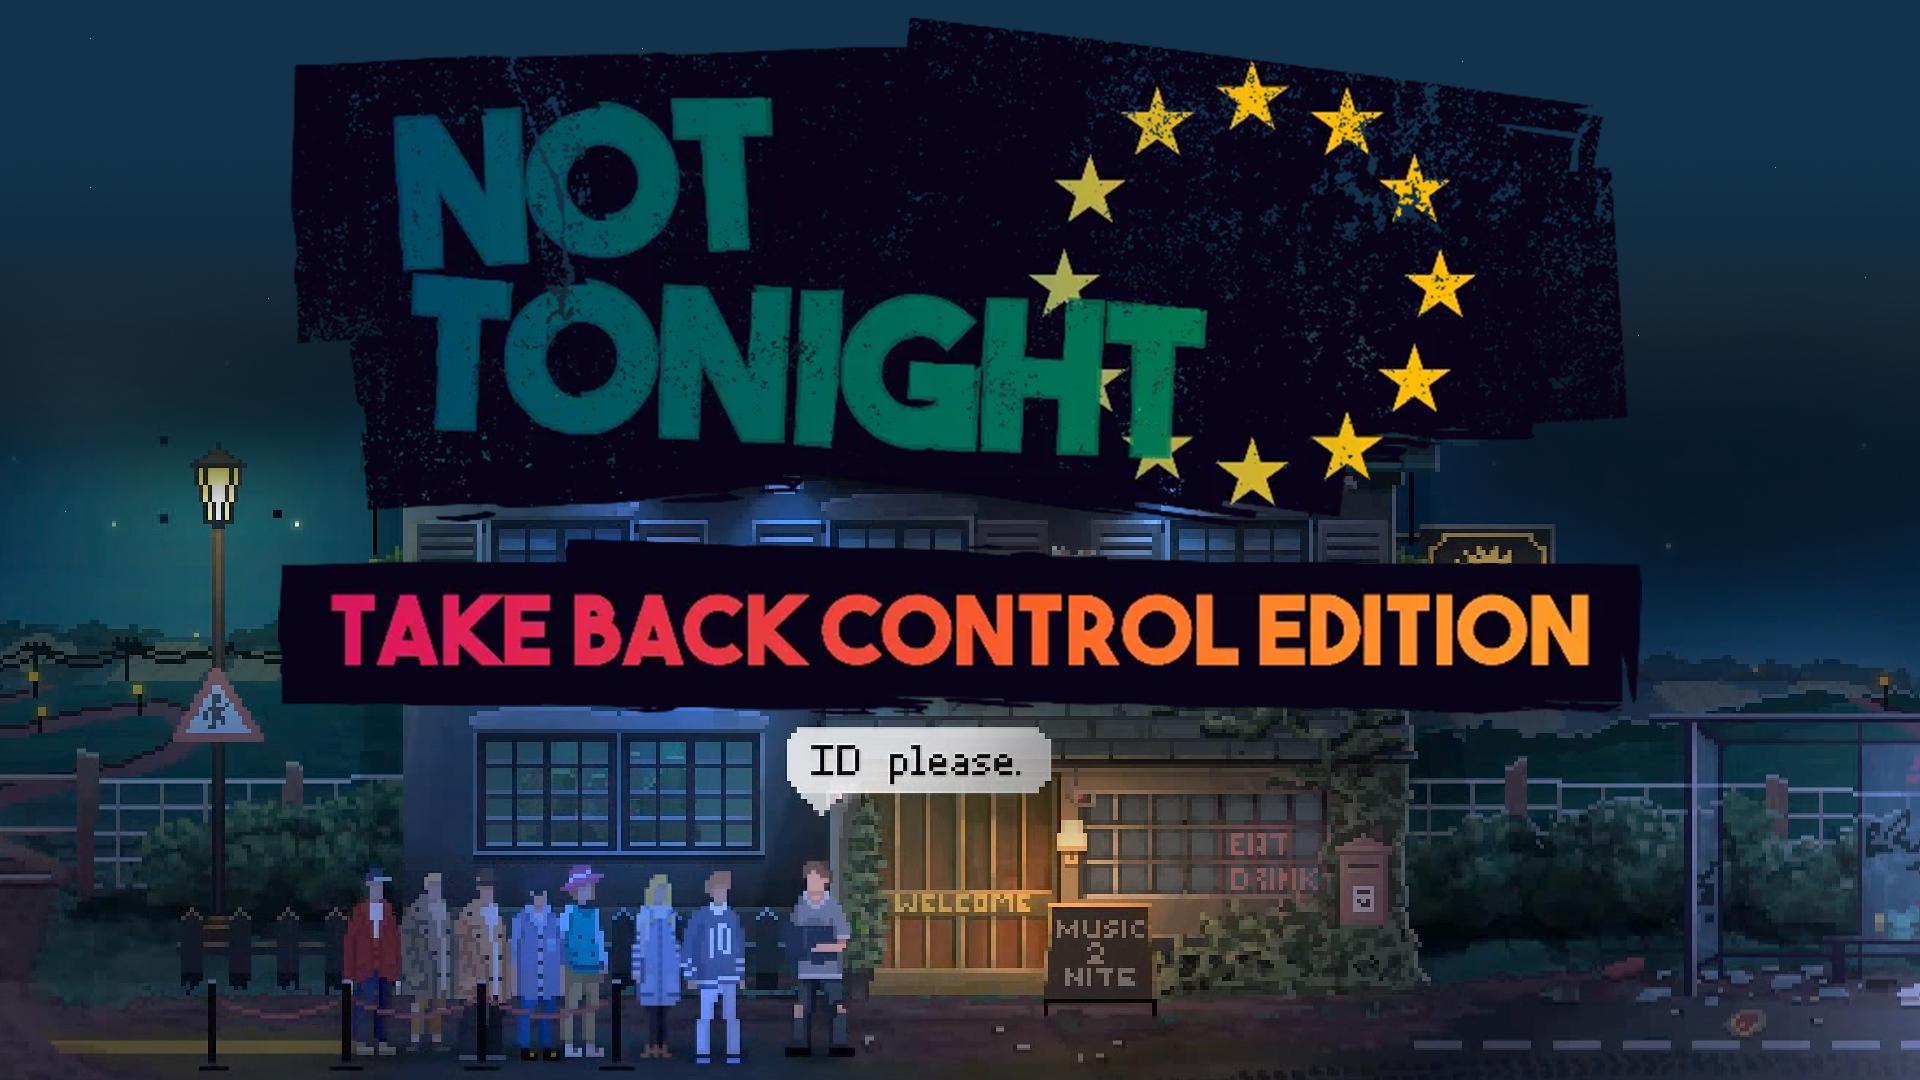 Not Tonight: Take Back Control Edition - Nintendo Switch (US/eShop) - $2.49